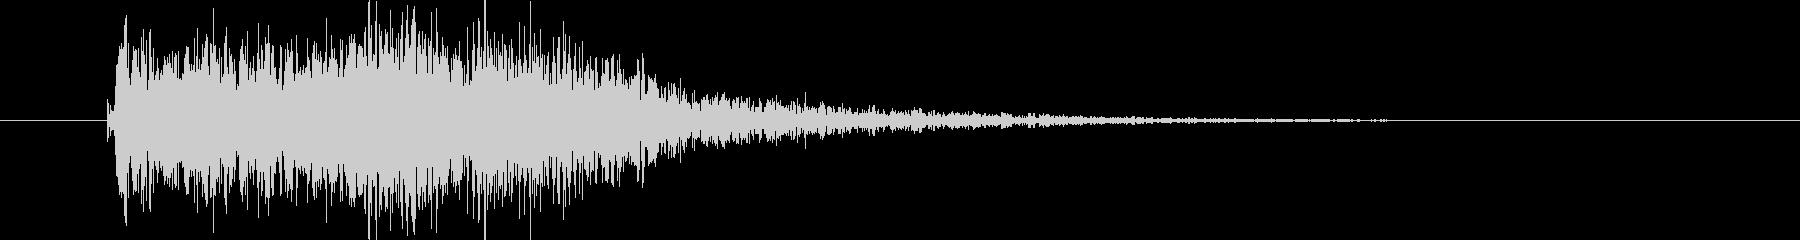 CINEMATIC BRAAMS_02の未再生の波形